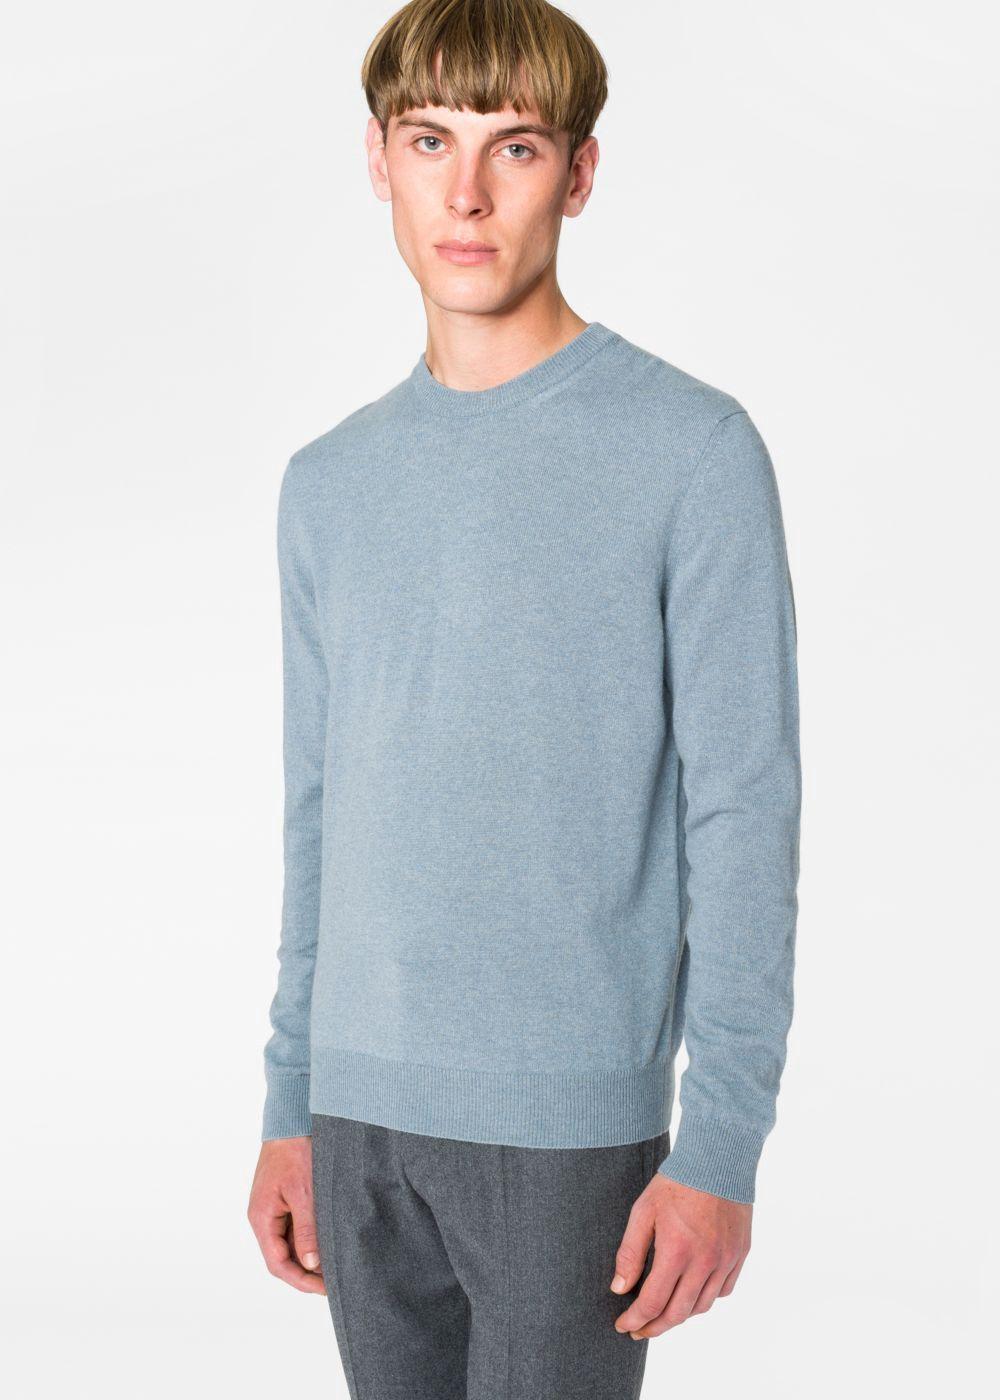 Paul Smith Men S Slate Blue Marl Cashmere Sweater Paulsmith Cloth Cashmere Sweater Men Sweaters Long Sleeve Tshirt Men [ 1400 x 1000 Pixel ]